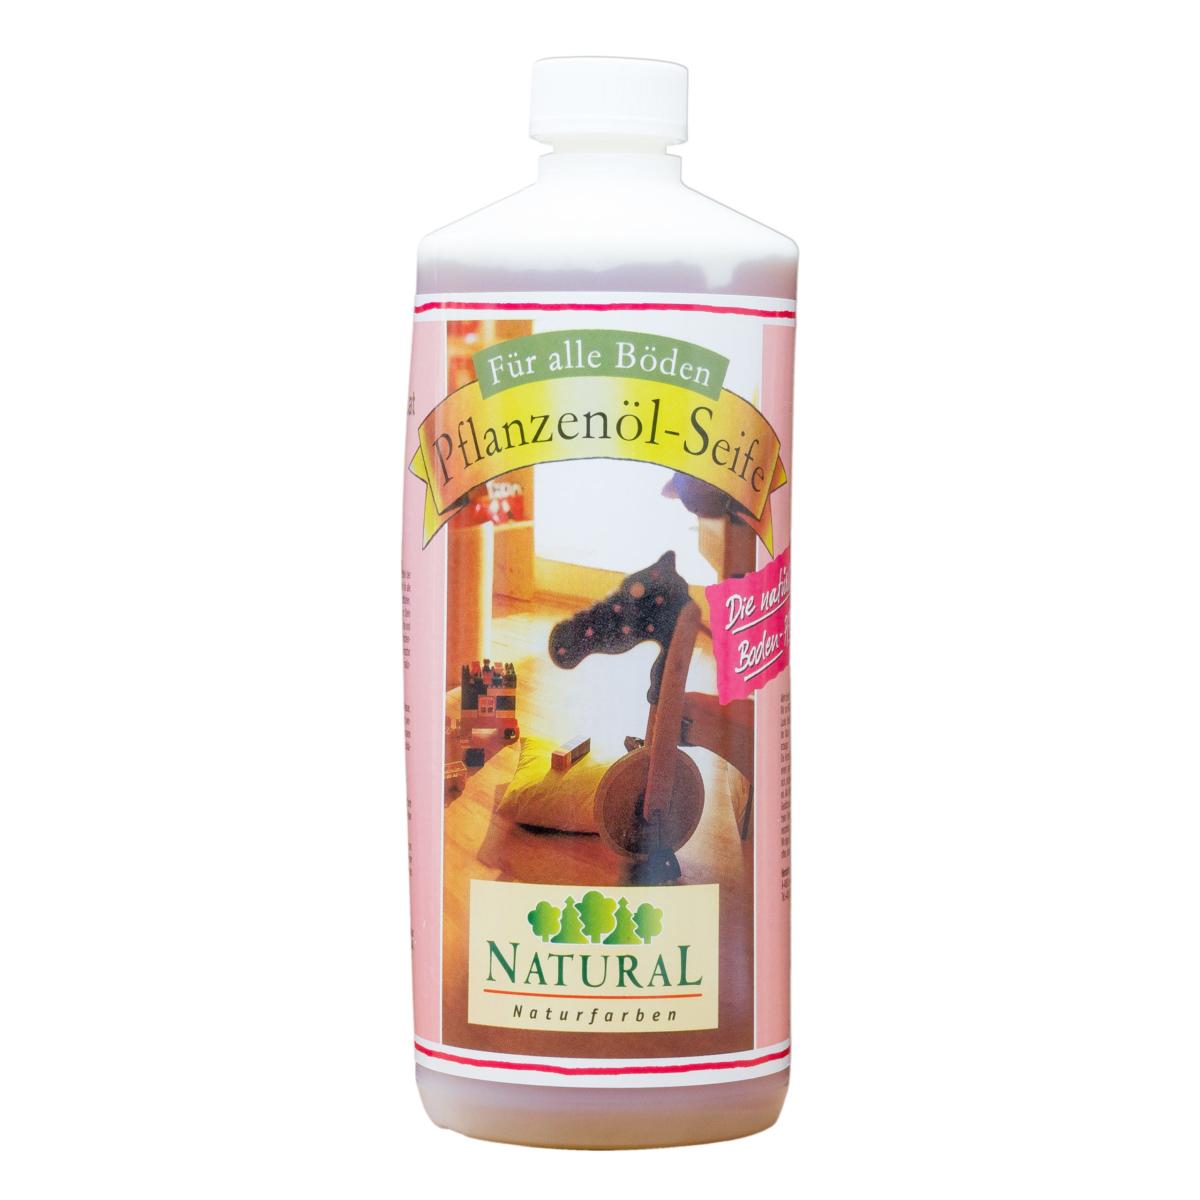 Natural Pflanzenöl Seife